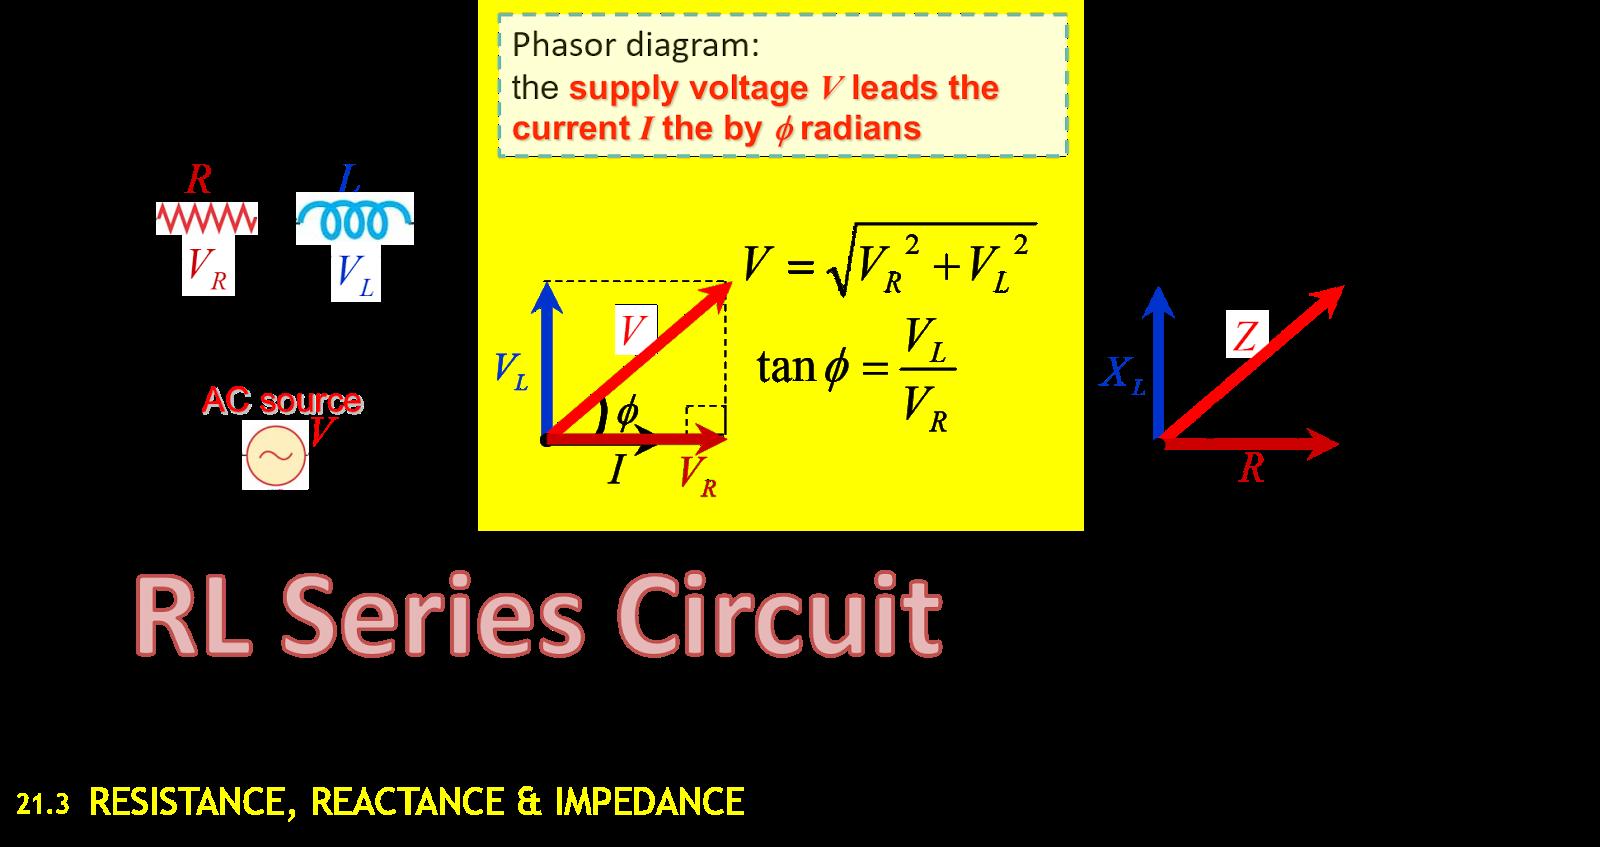 Sf026 Rohit Ac 3 Rc Rl Rcl Circuits Resistive Series Parallel Rlc Circuit Graphic